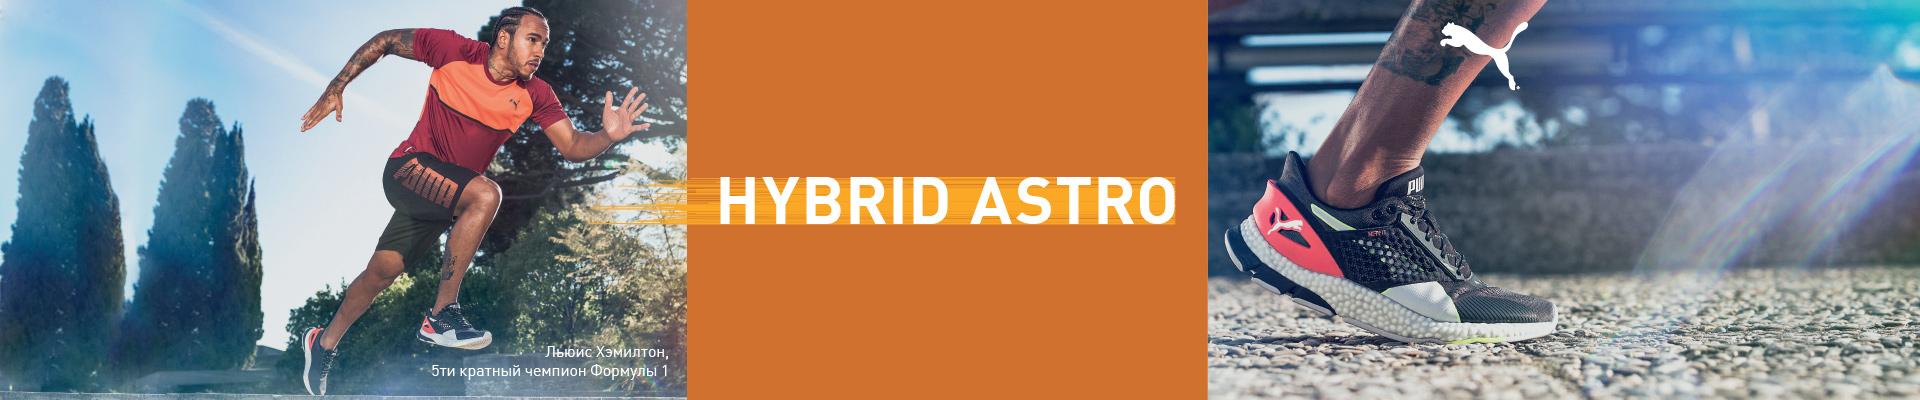 Hybrid Astro